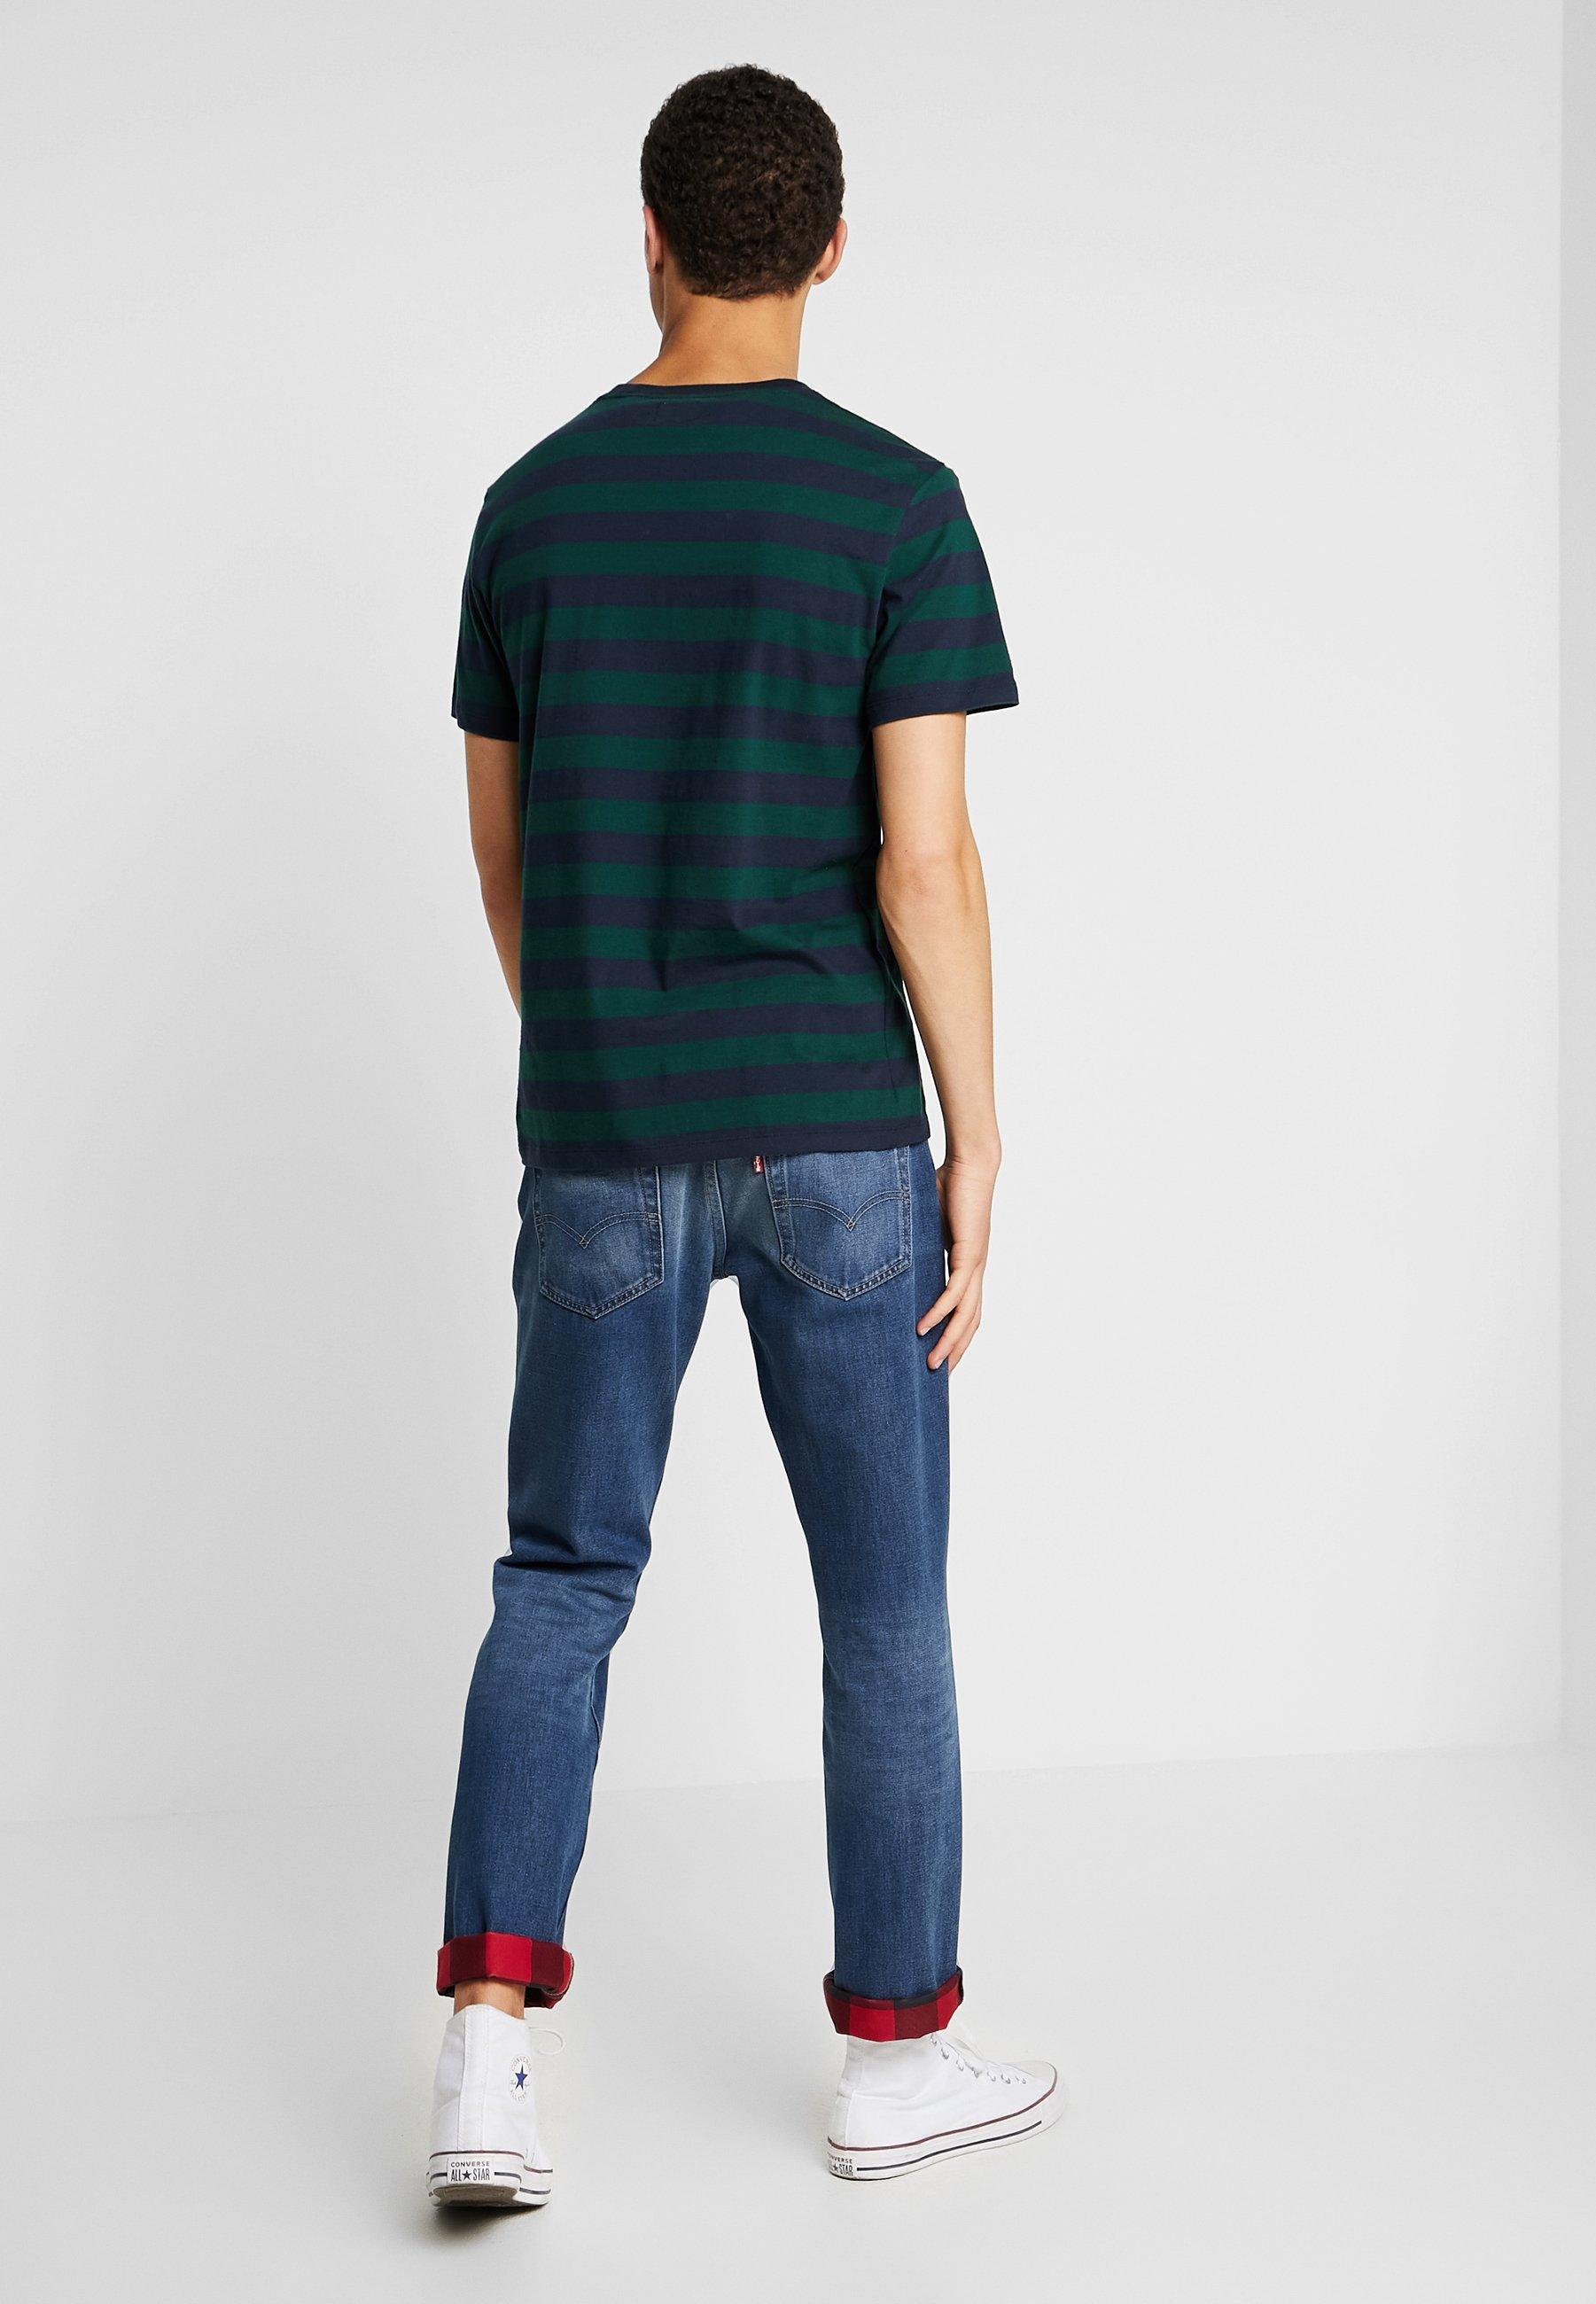 PocketT In shirt pine Nightwatch Sunset Imprimé Blue Set Grove Levi's® k8nOw0XP